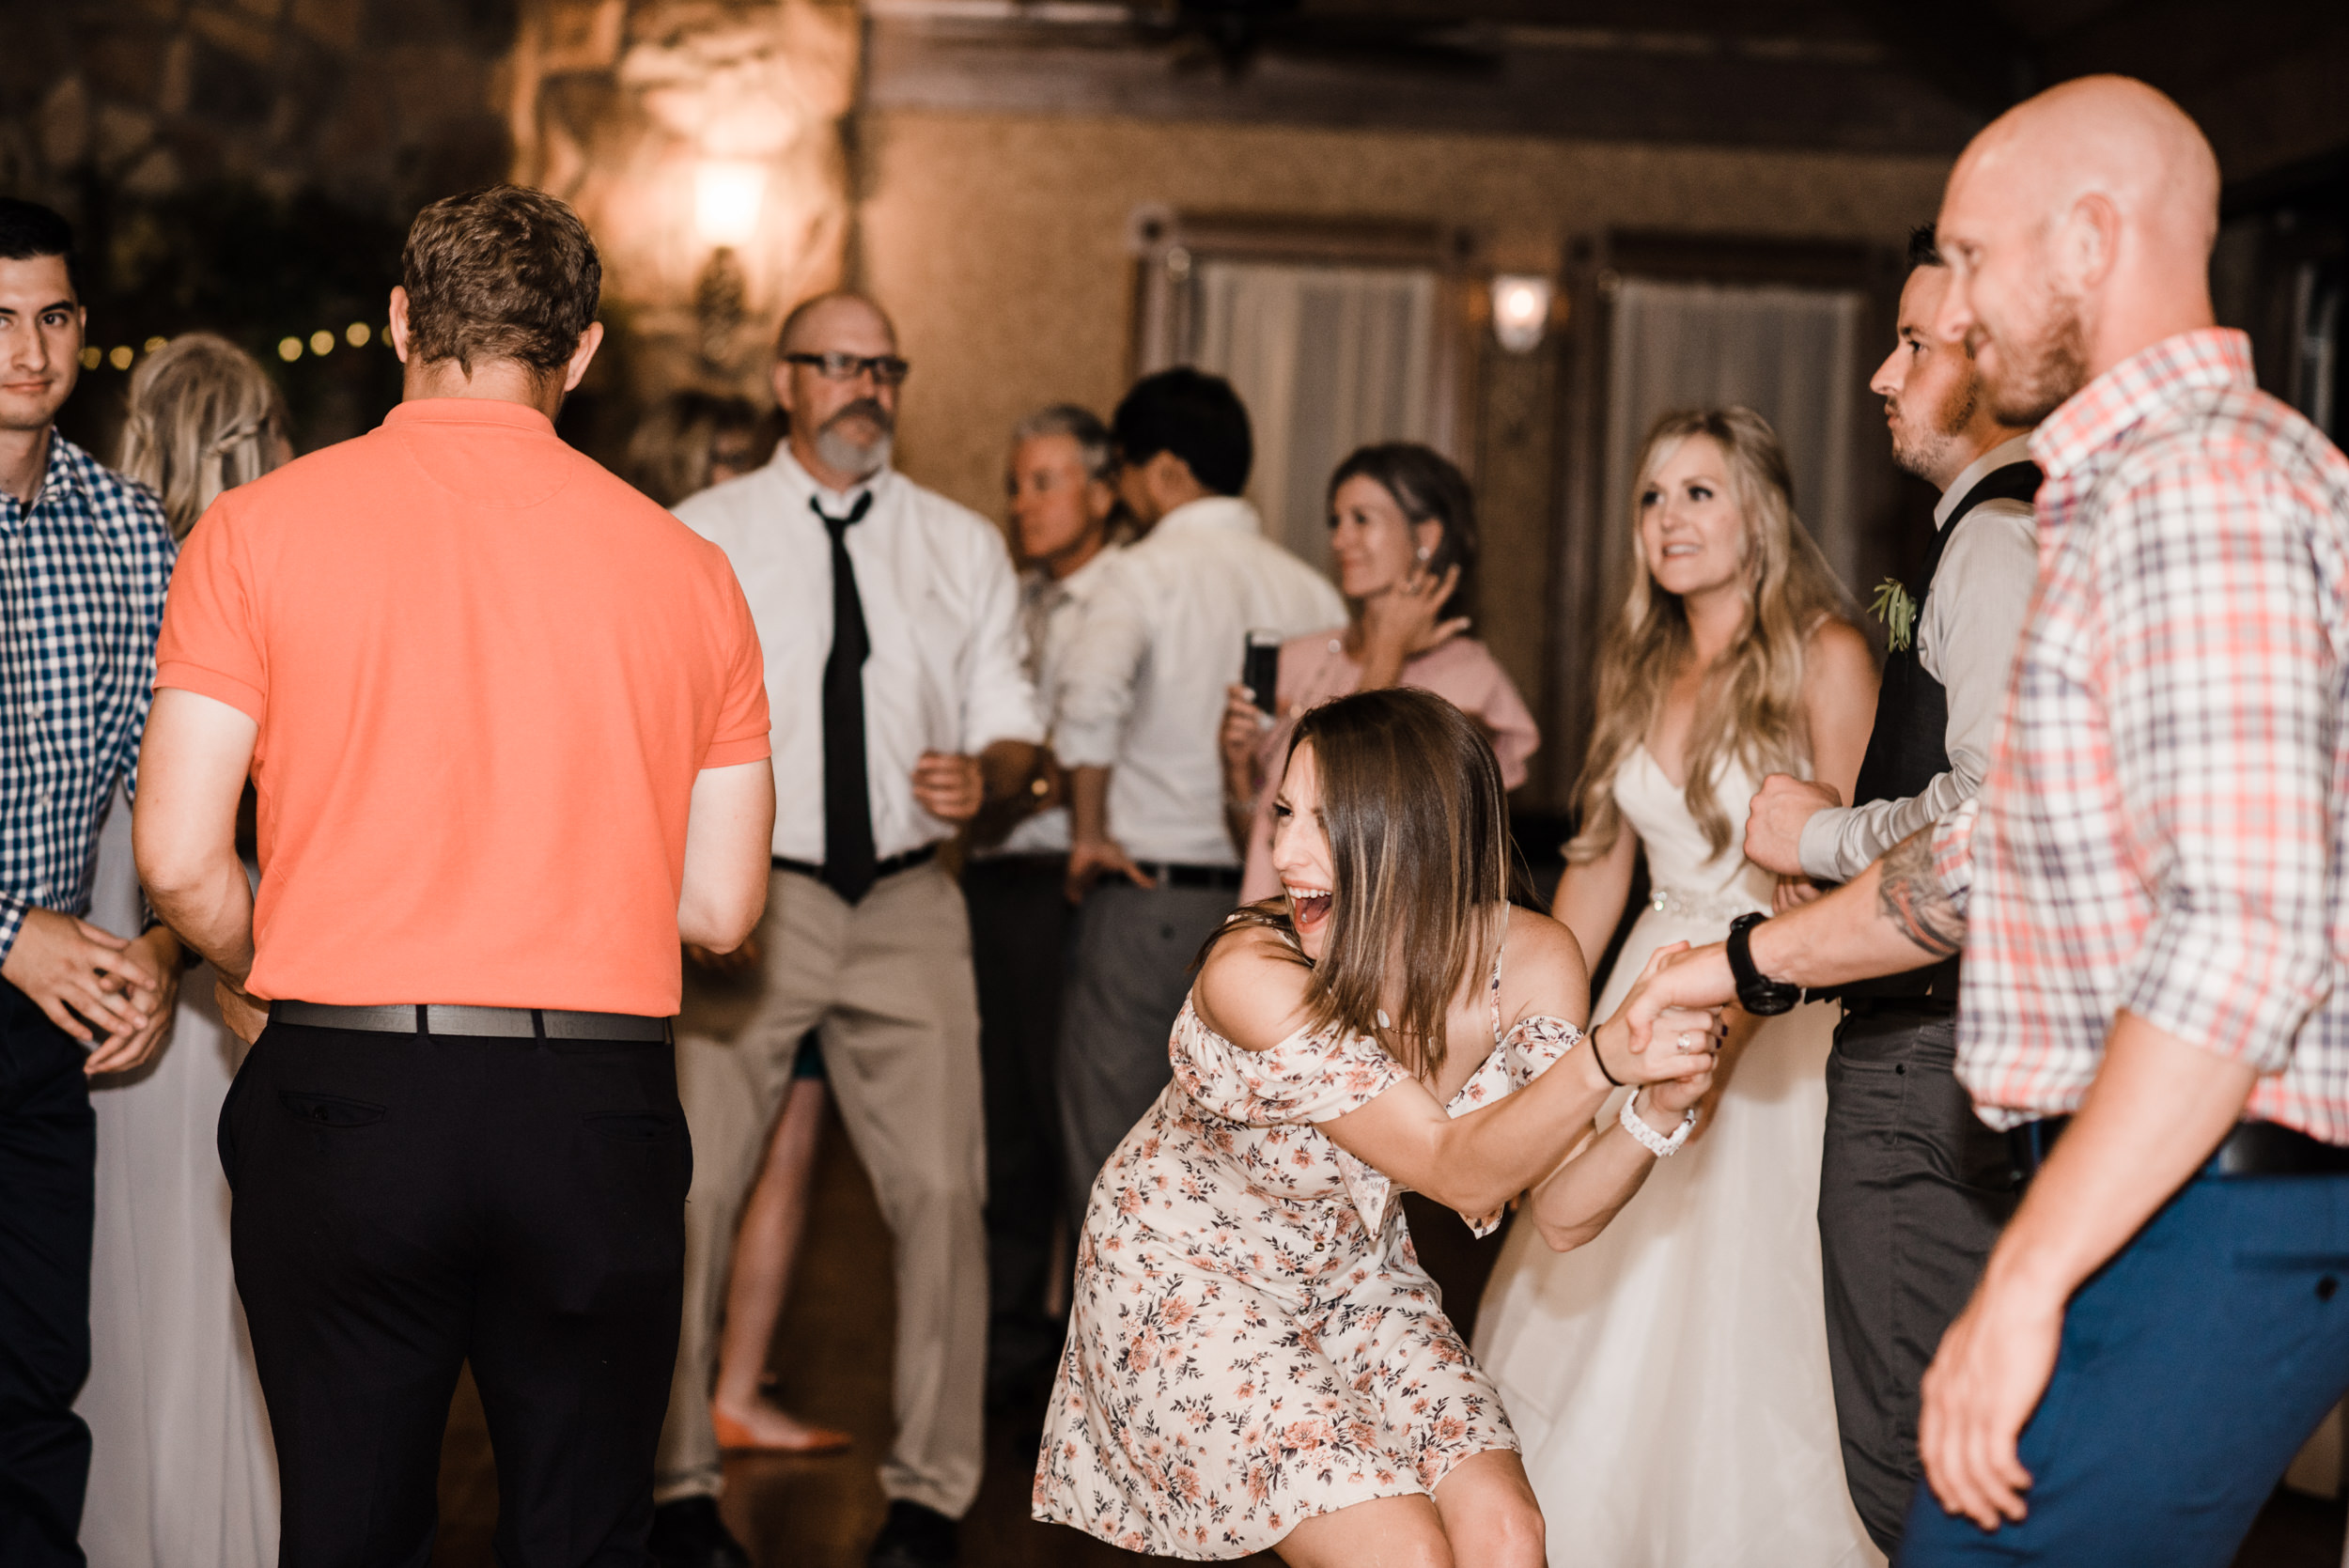 Colorado mountain wedding photographer at Brookeside Gardens wedding reception people dancing and having a good time